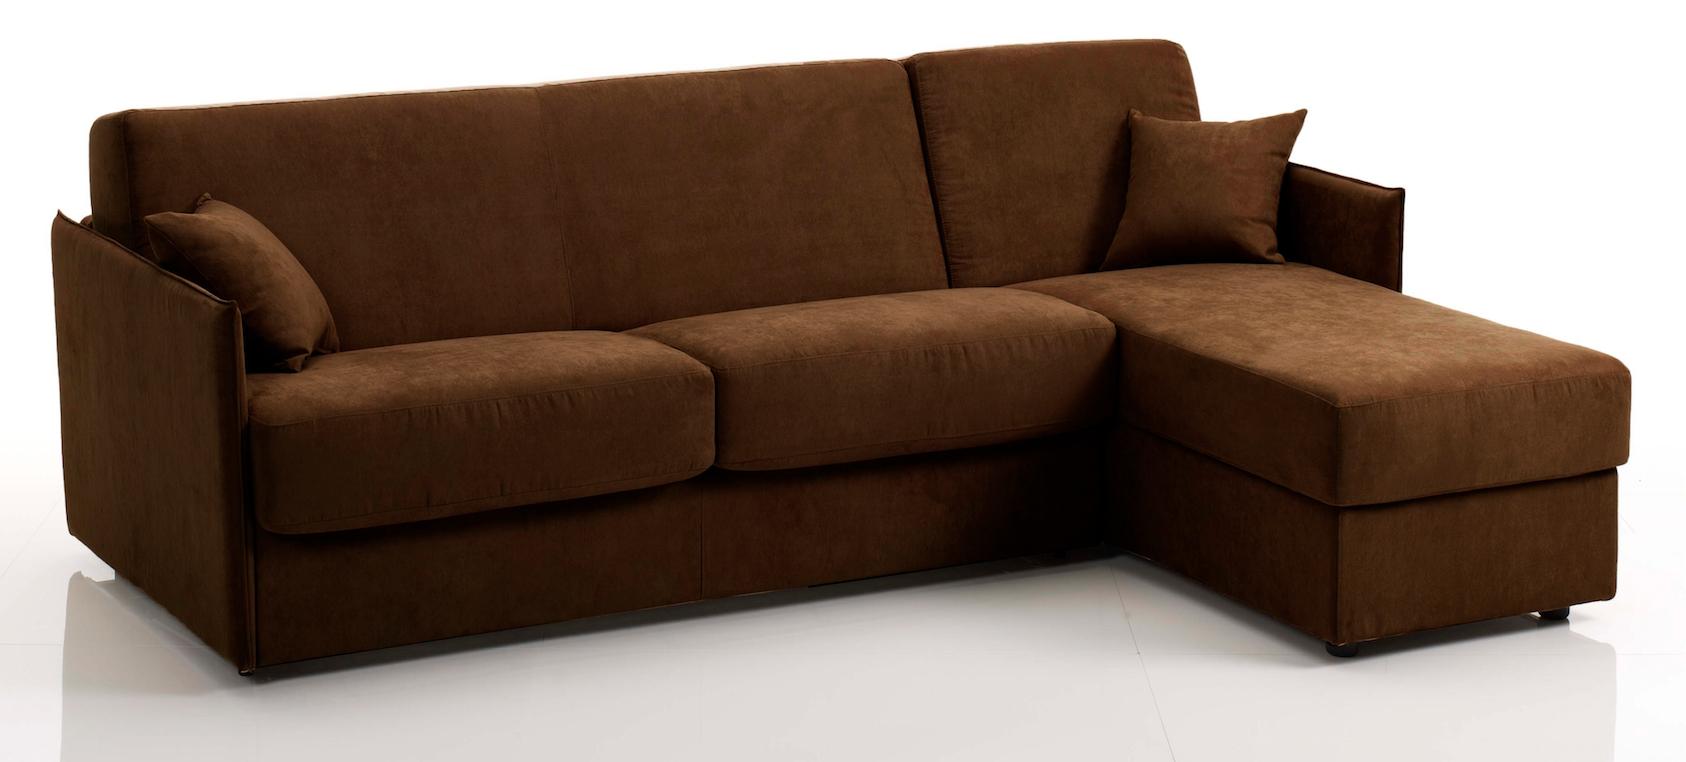 canap d 39 angle convertible bultex tissu marron swelt. Black Bedroom Furniture Sets. Home Design Ideas